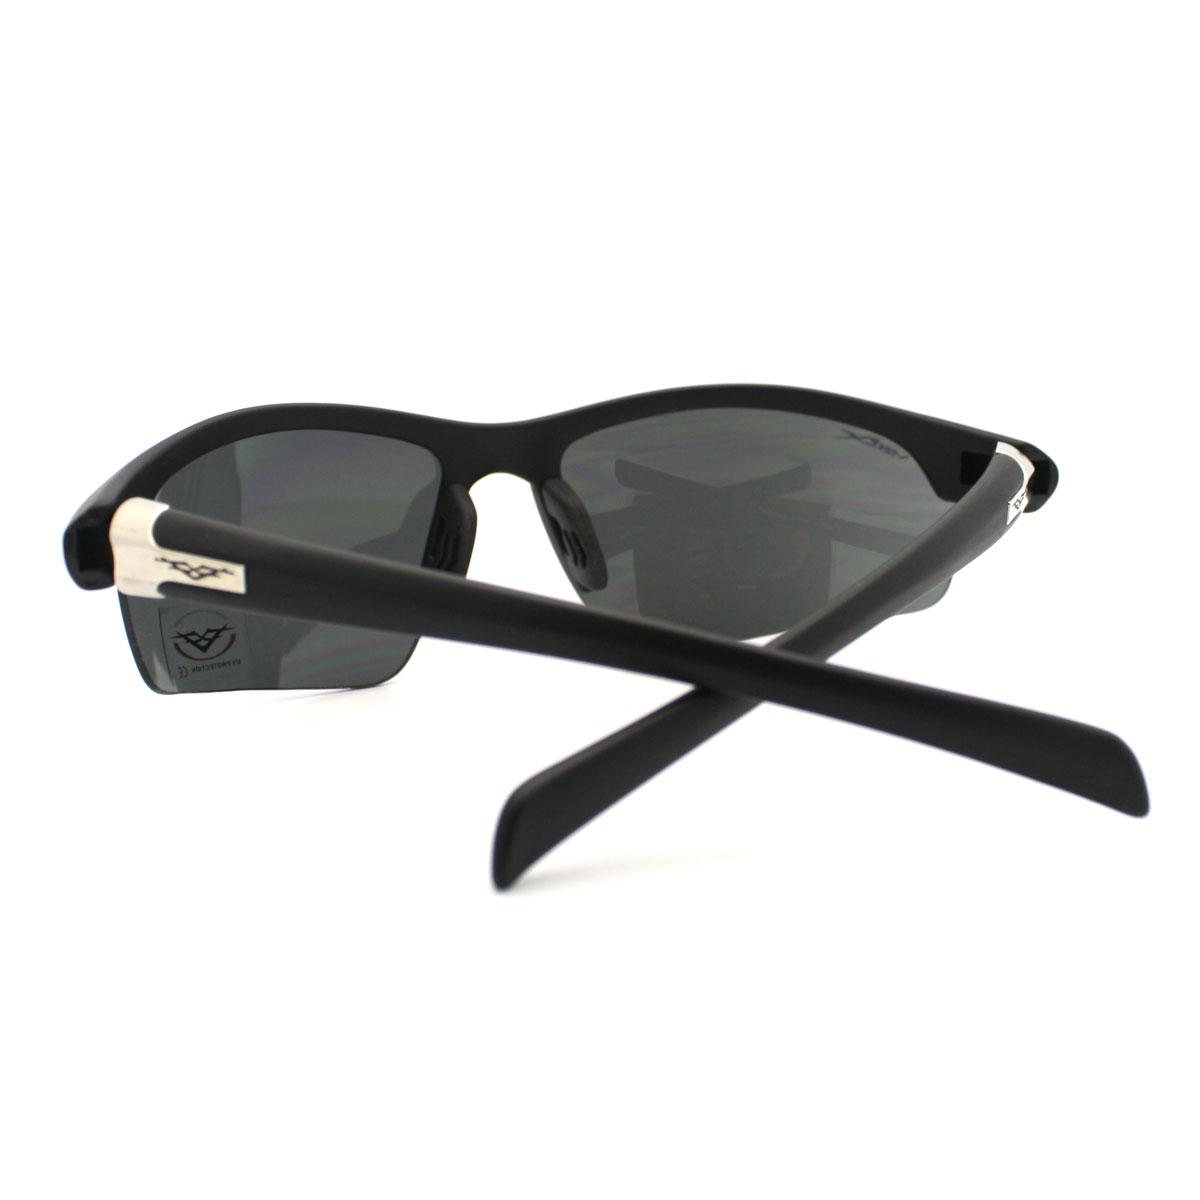 d133f03ba5 New Sports Sunglasses Half Rim Wrap Around Outdoor Shades Mens Black ...